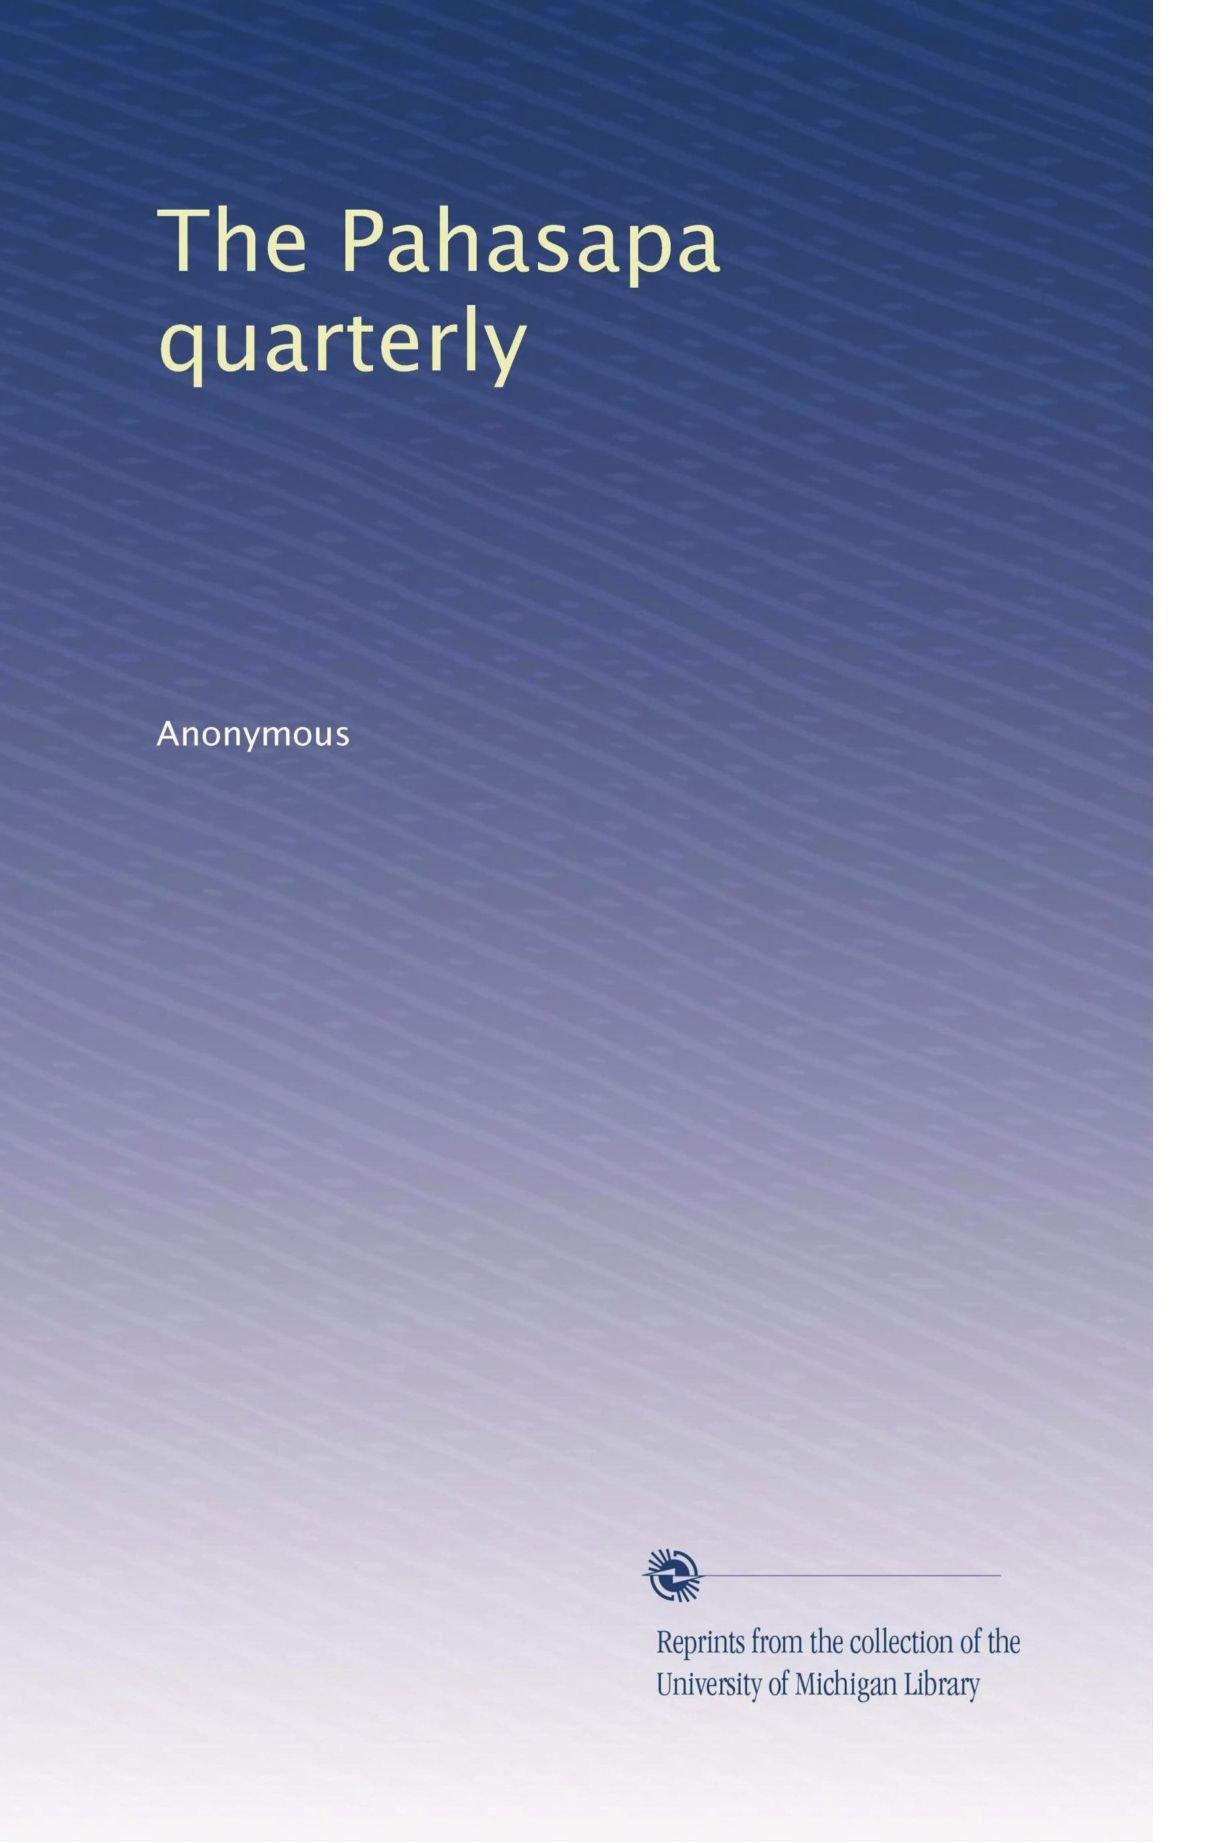 Download The Pahasapa quarterly (Volume 3) ebook